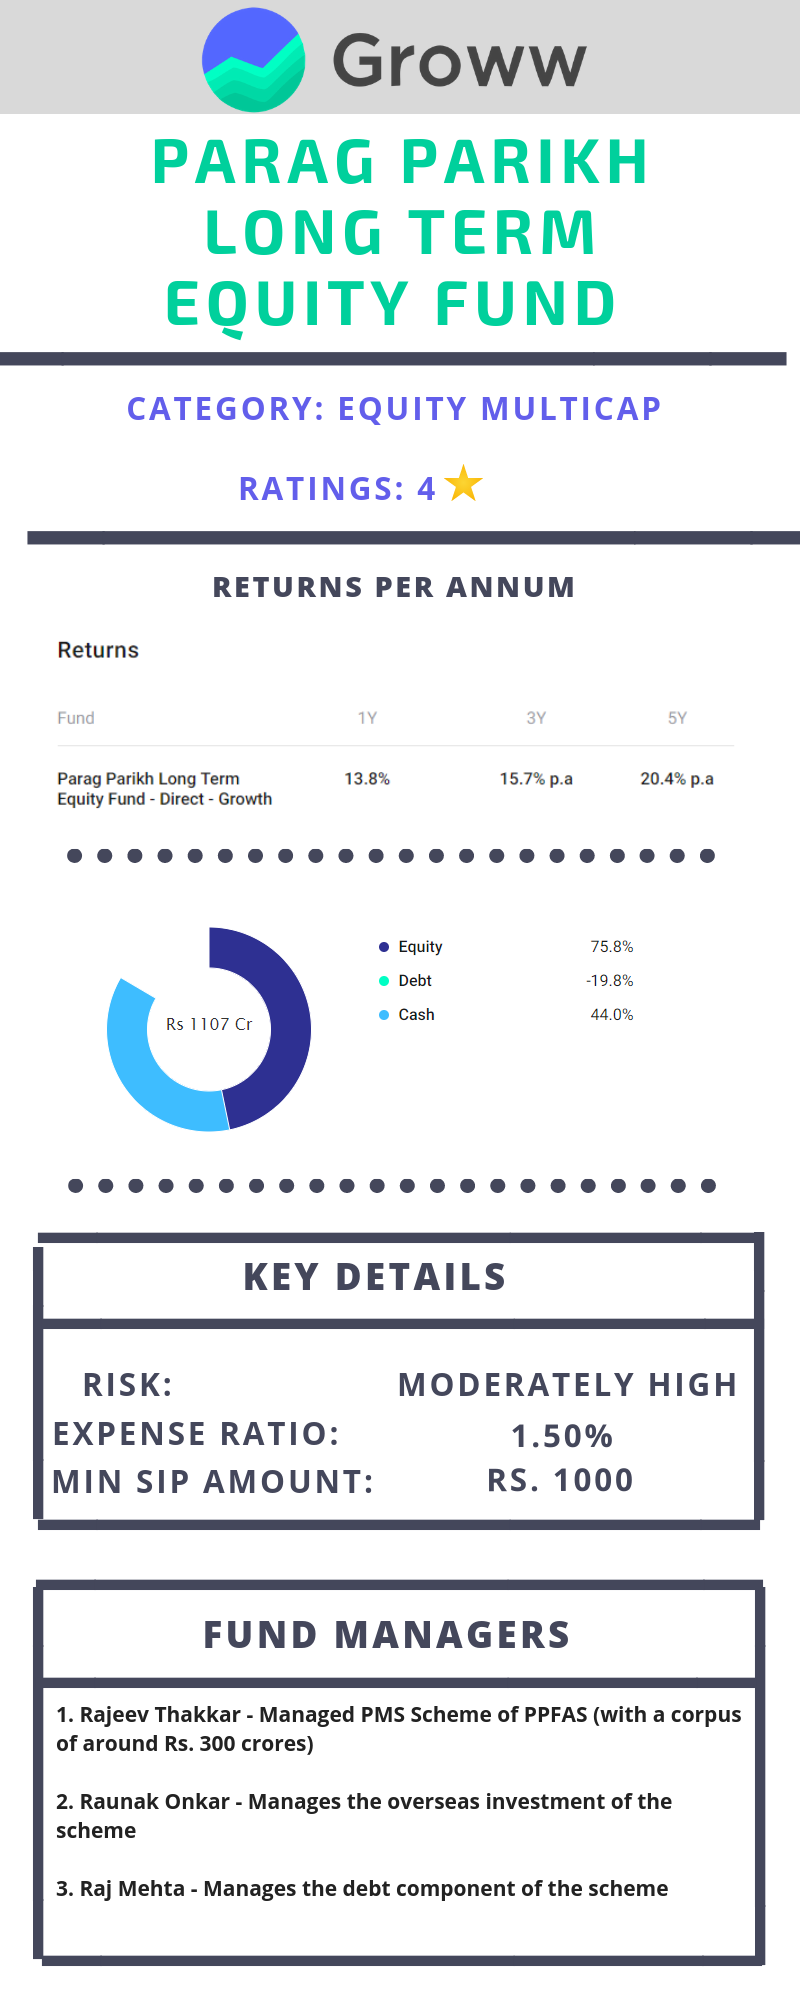 parag parikh long term equity fund analysis